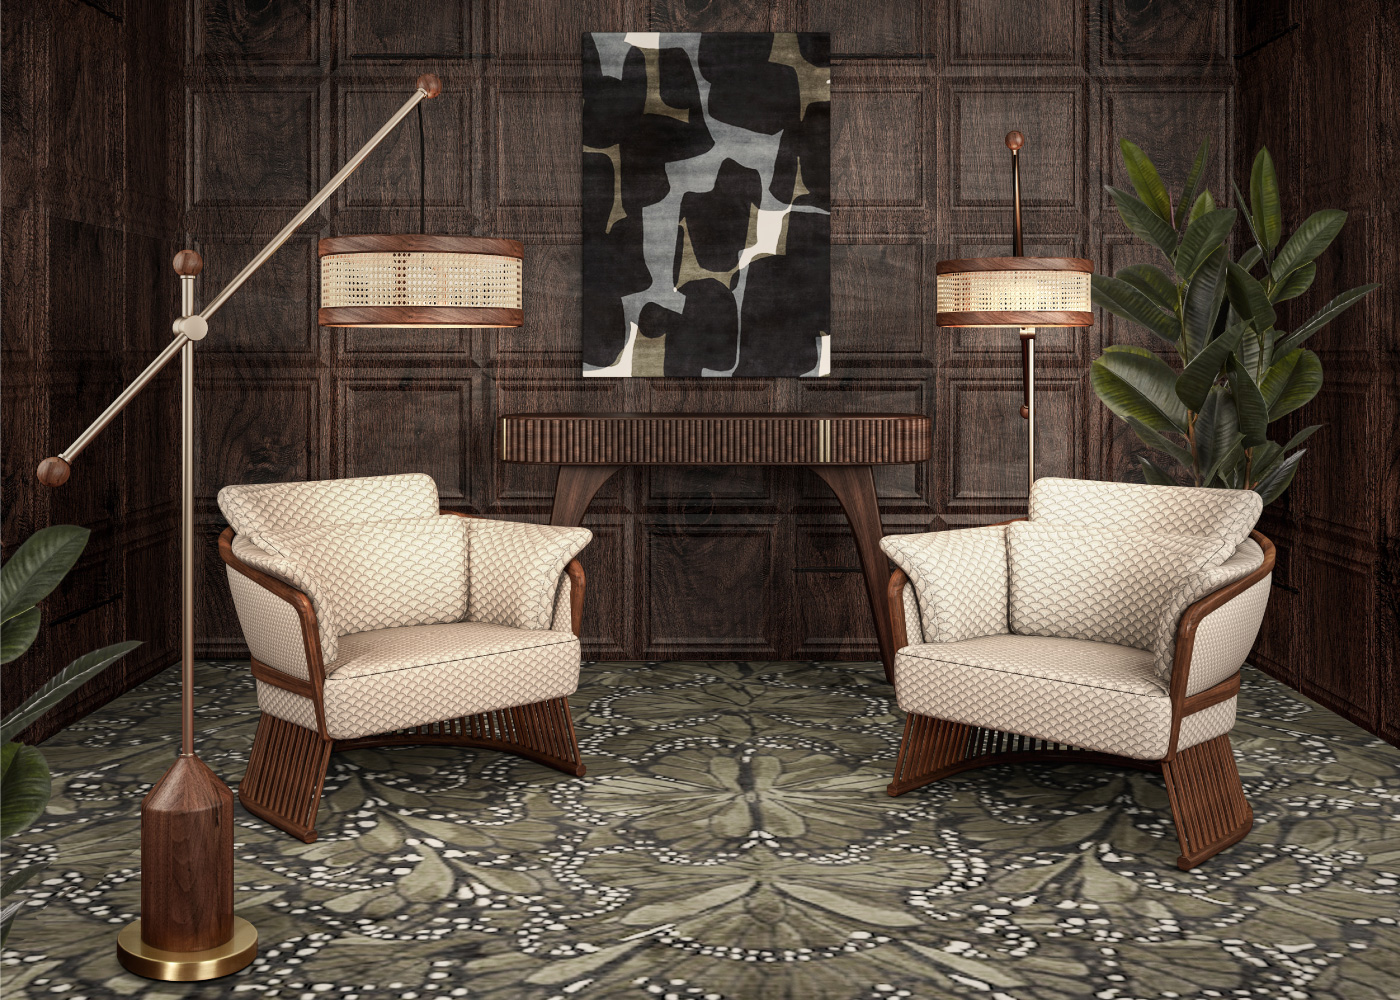 Hamilton Floor Lamp with rattan